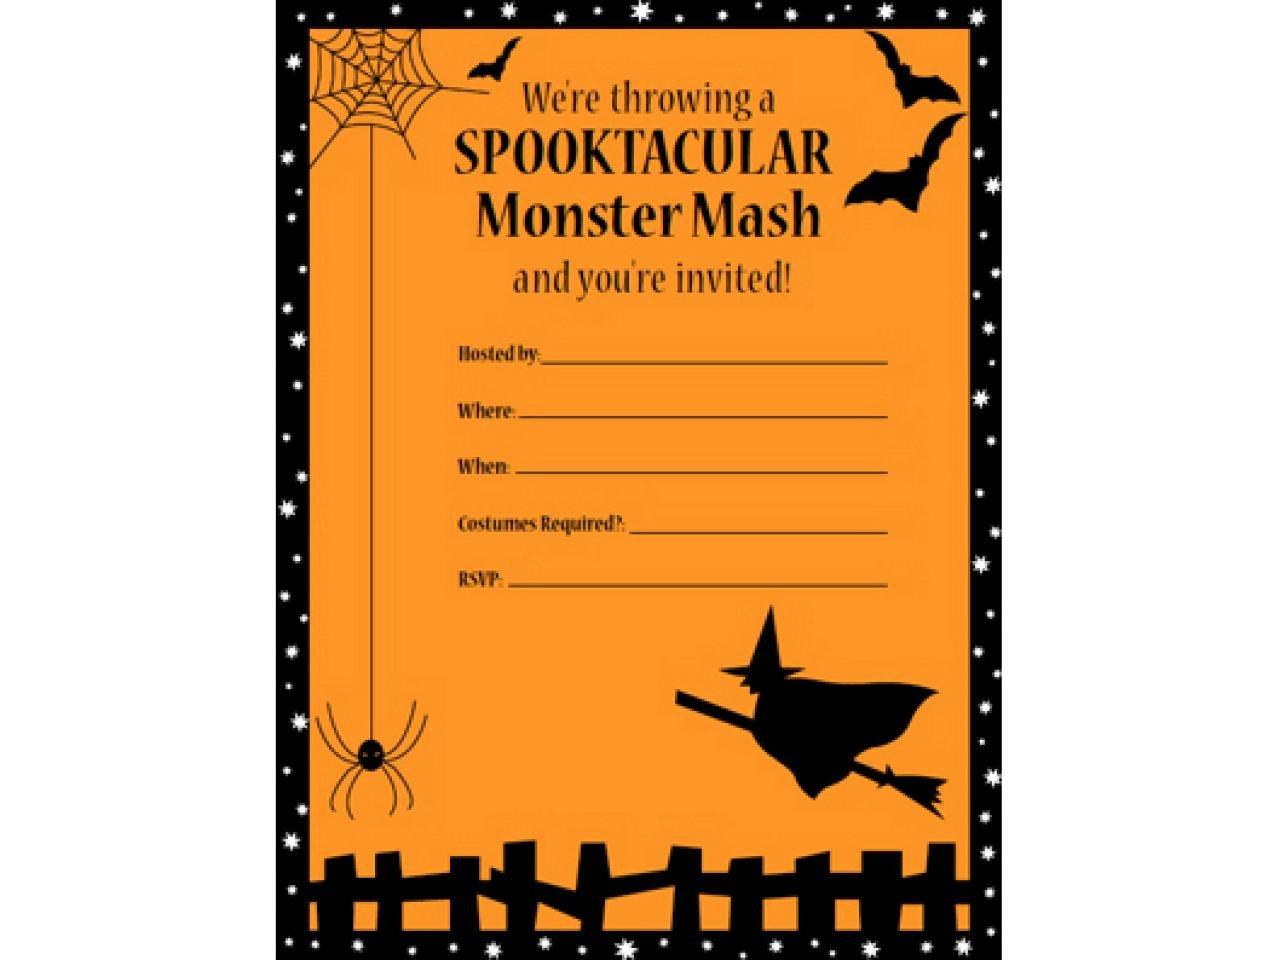 Free Halloween Invite Templates 41 Printable and Free Halloween Templates